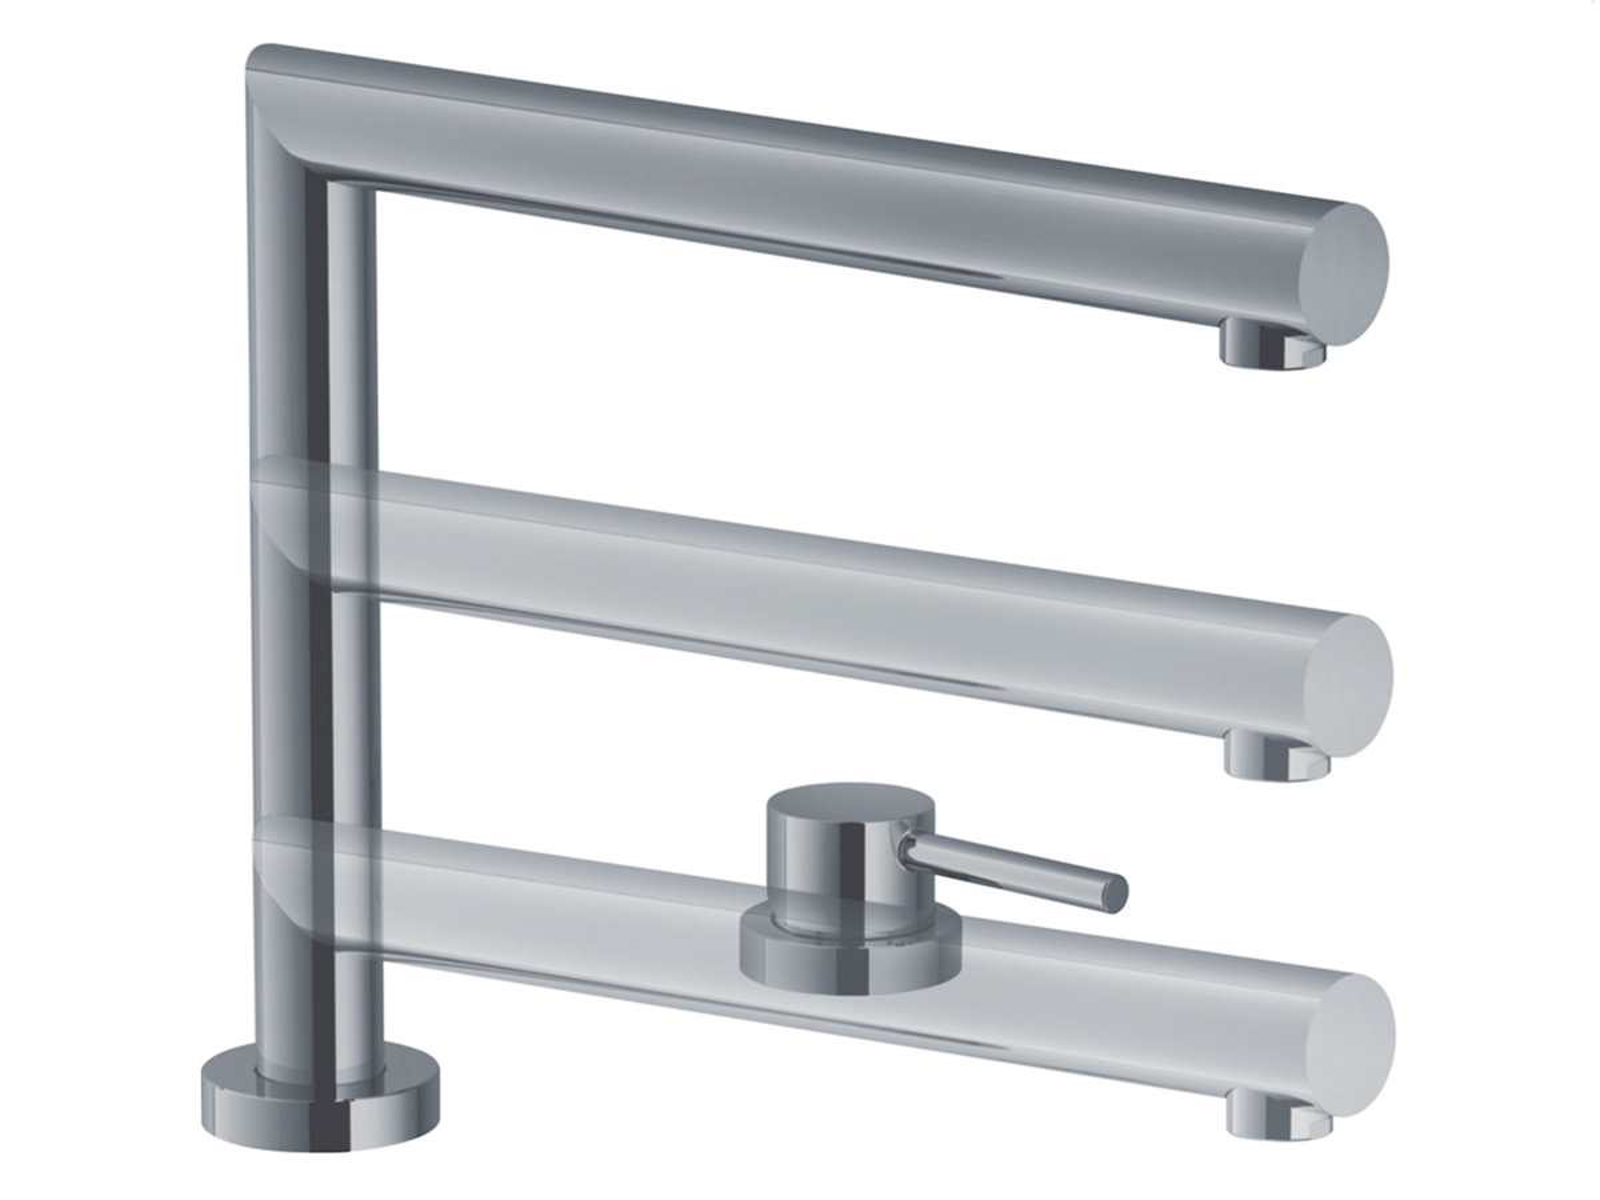 Franke Active Window Edelstahl-Optik - 115.0486.991 Hochdruckarmatur